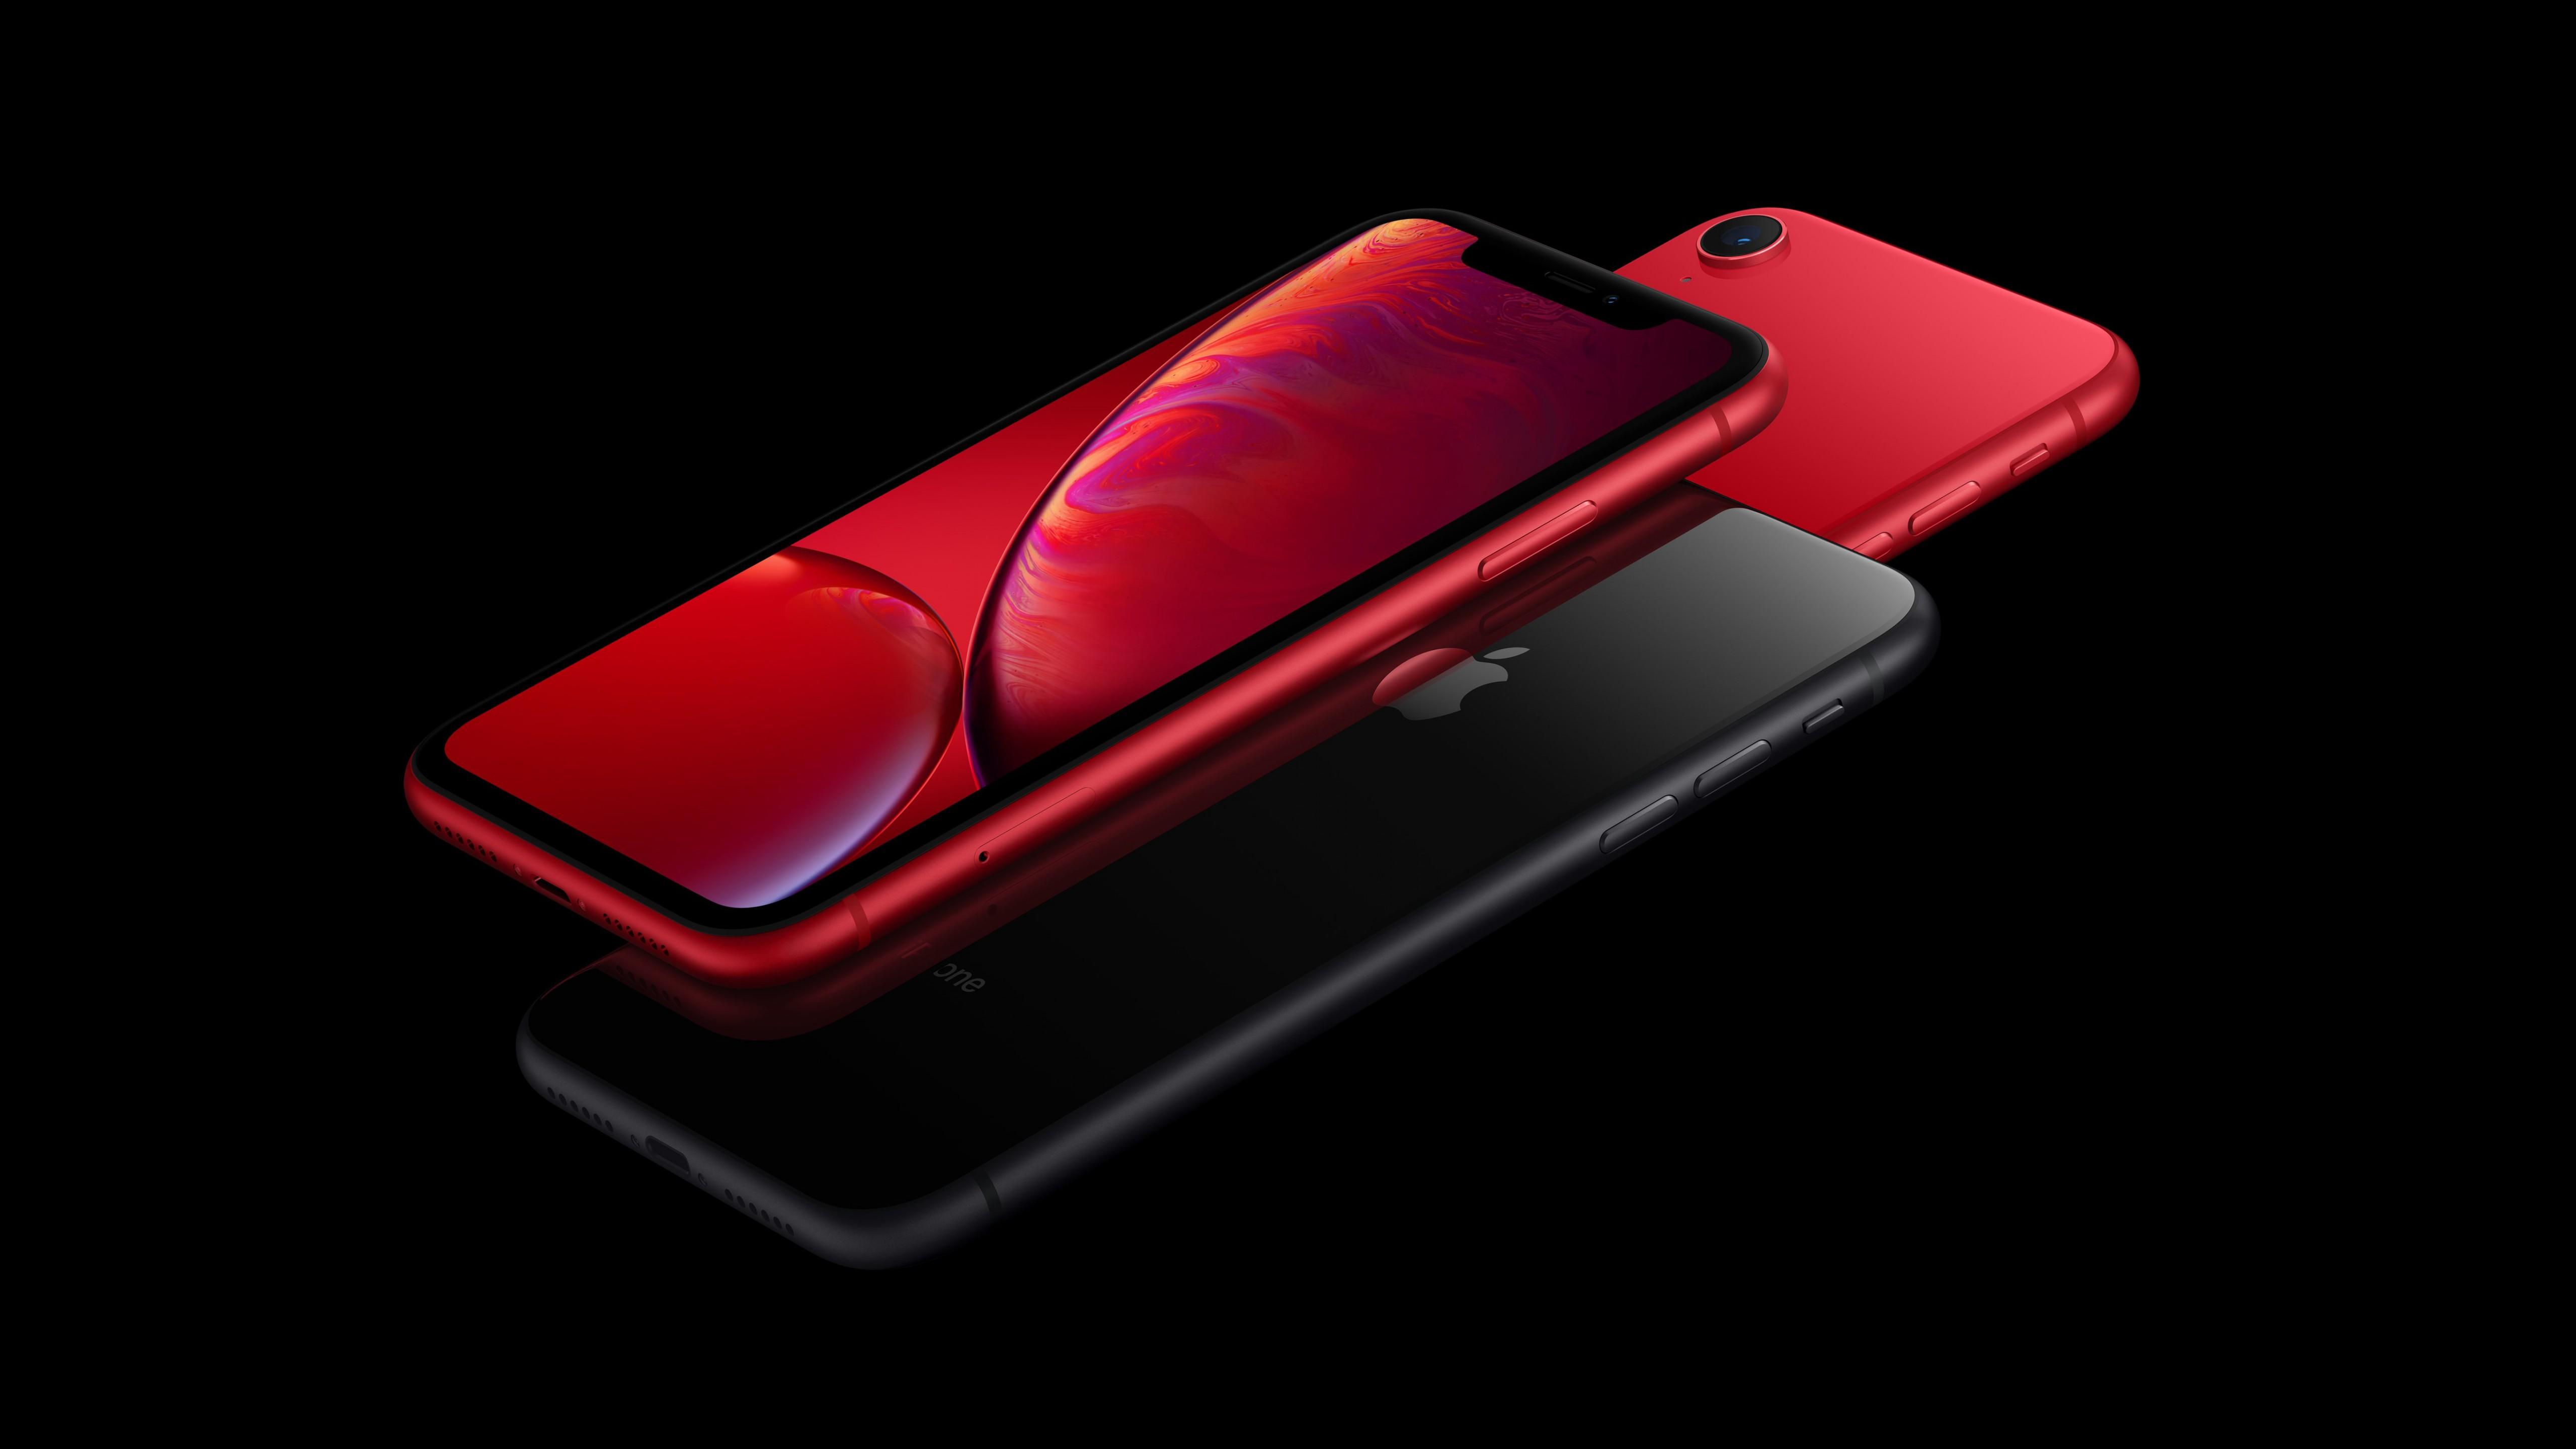 HDoboi.Kiev.ua - Apple iPhone XR красного и черного цвета